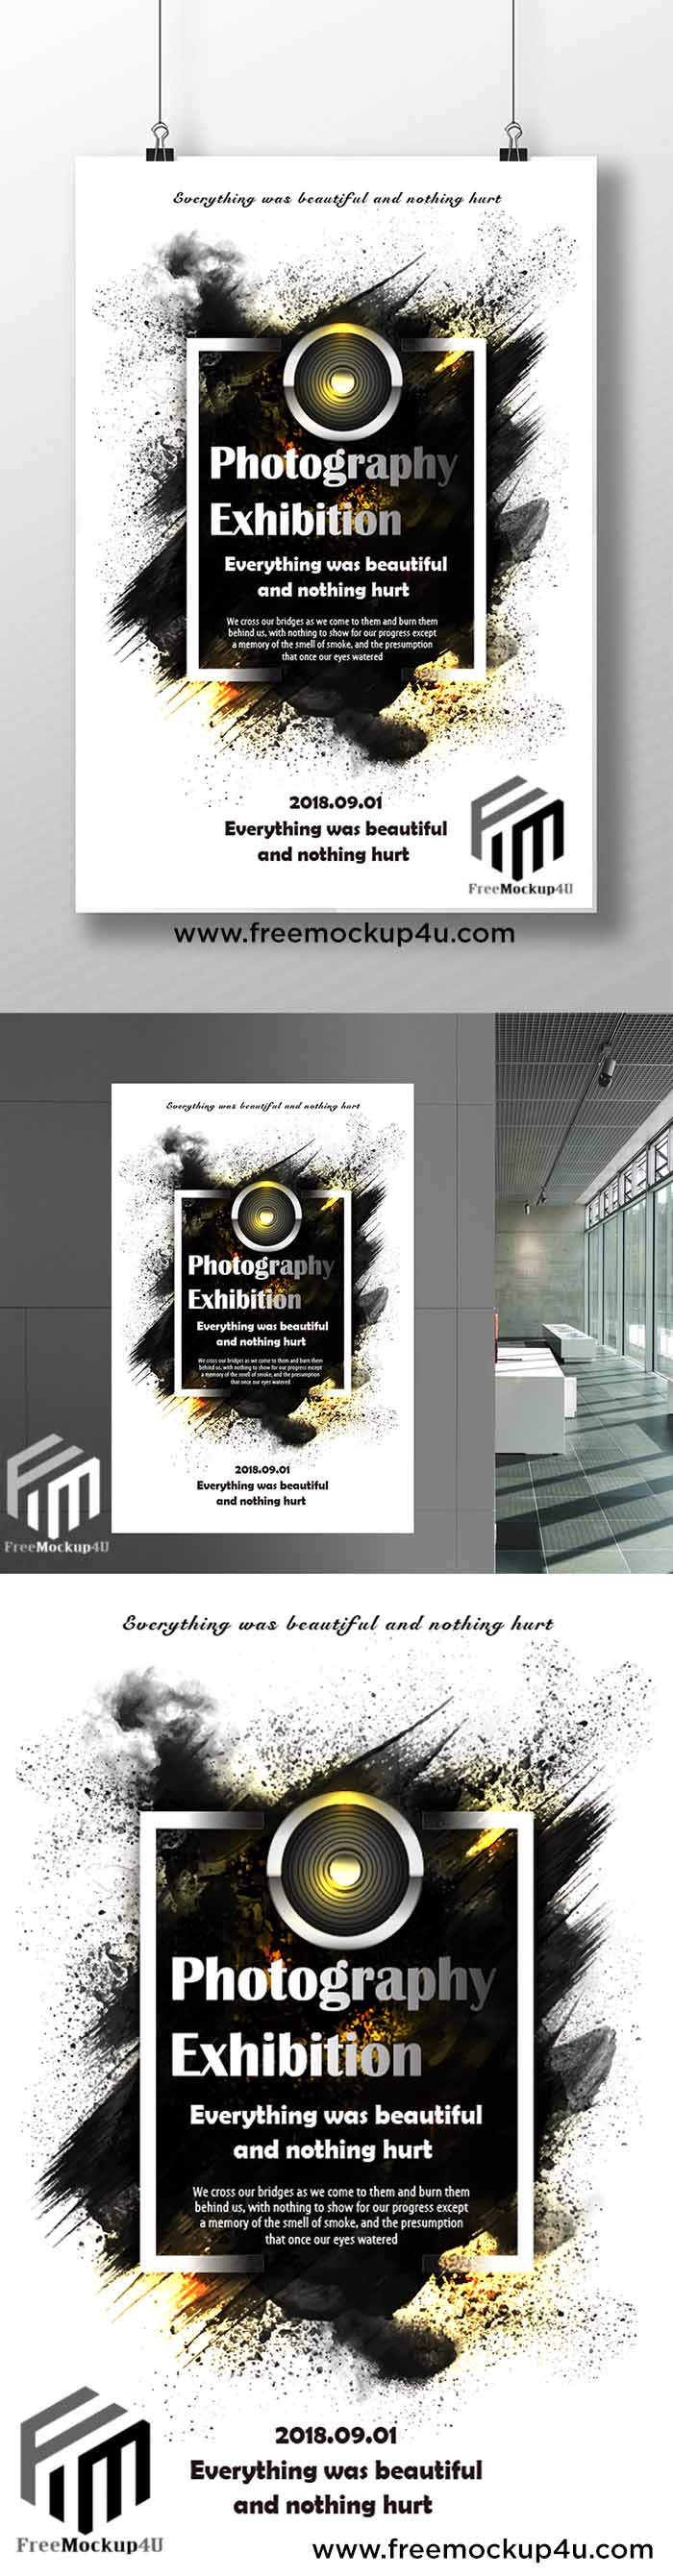 Creative Concise Art Photography Work Exhibition Poster Templates AI